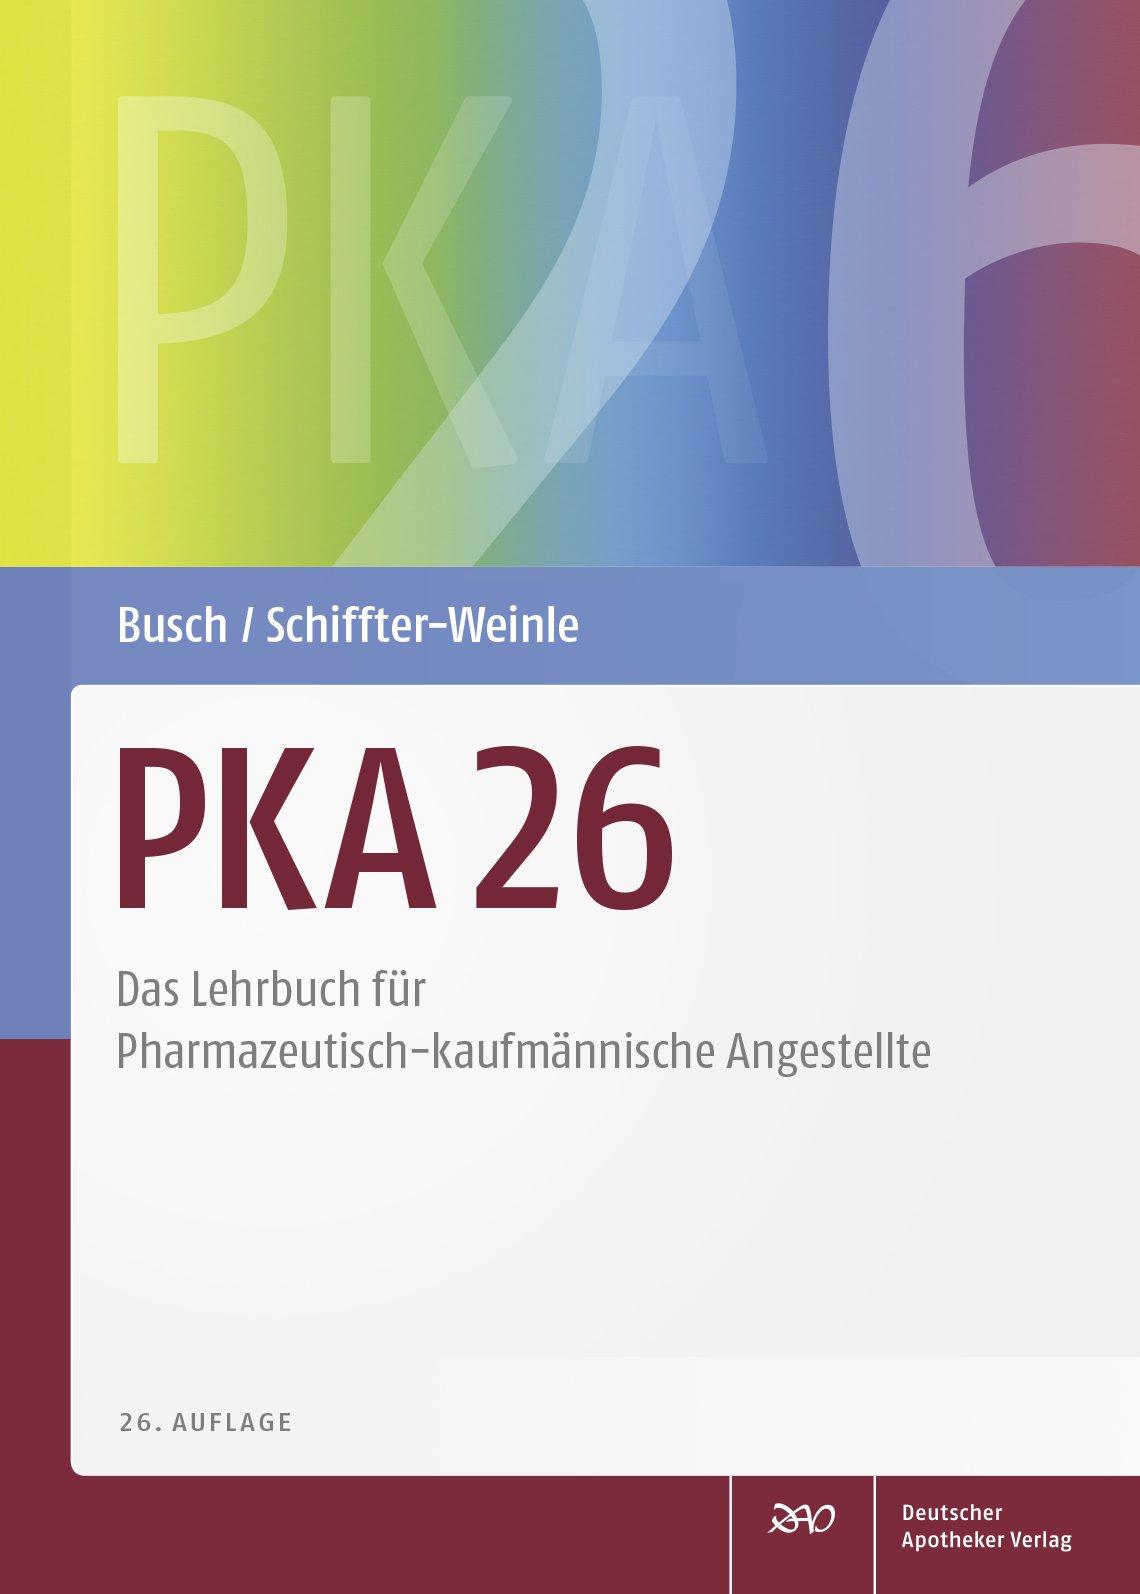 PKA 26 - Shop - Mediengruppe Deutscher Apotheker Verlag